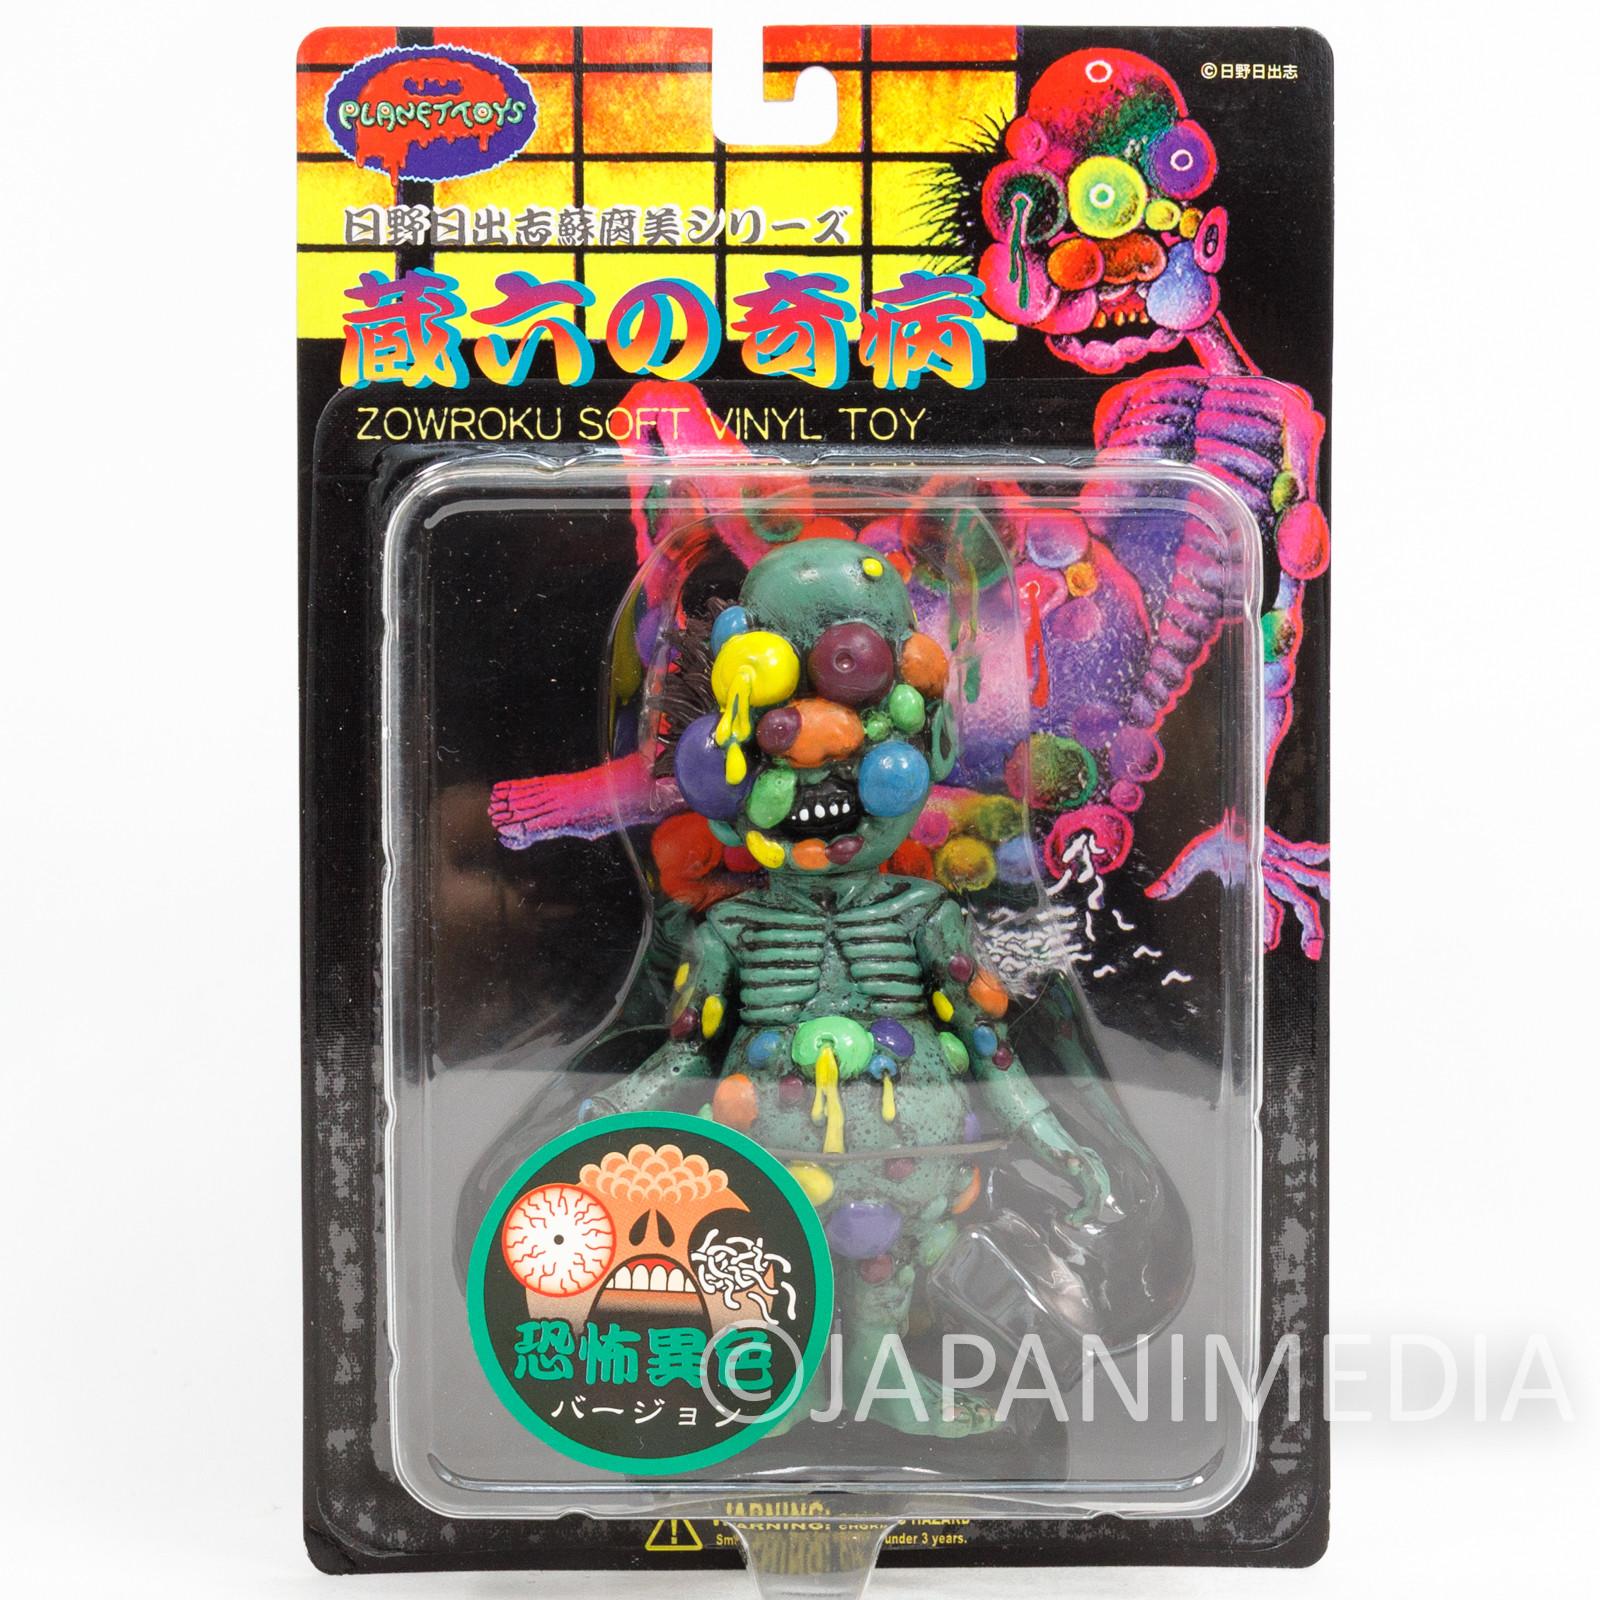 RARE! Zowroku no Kibyou Figure Hideshi Hino Planet Toys JAPAN MANGA HORROR 4